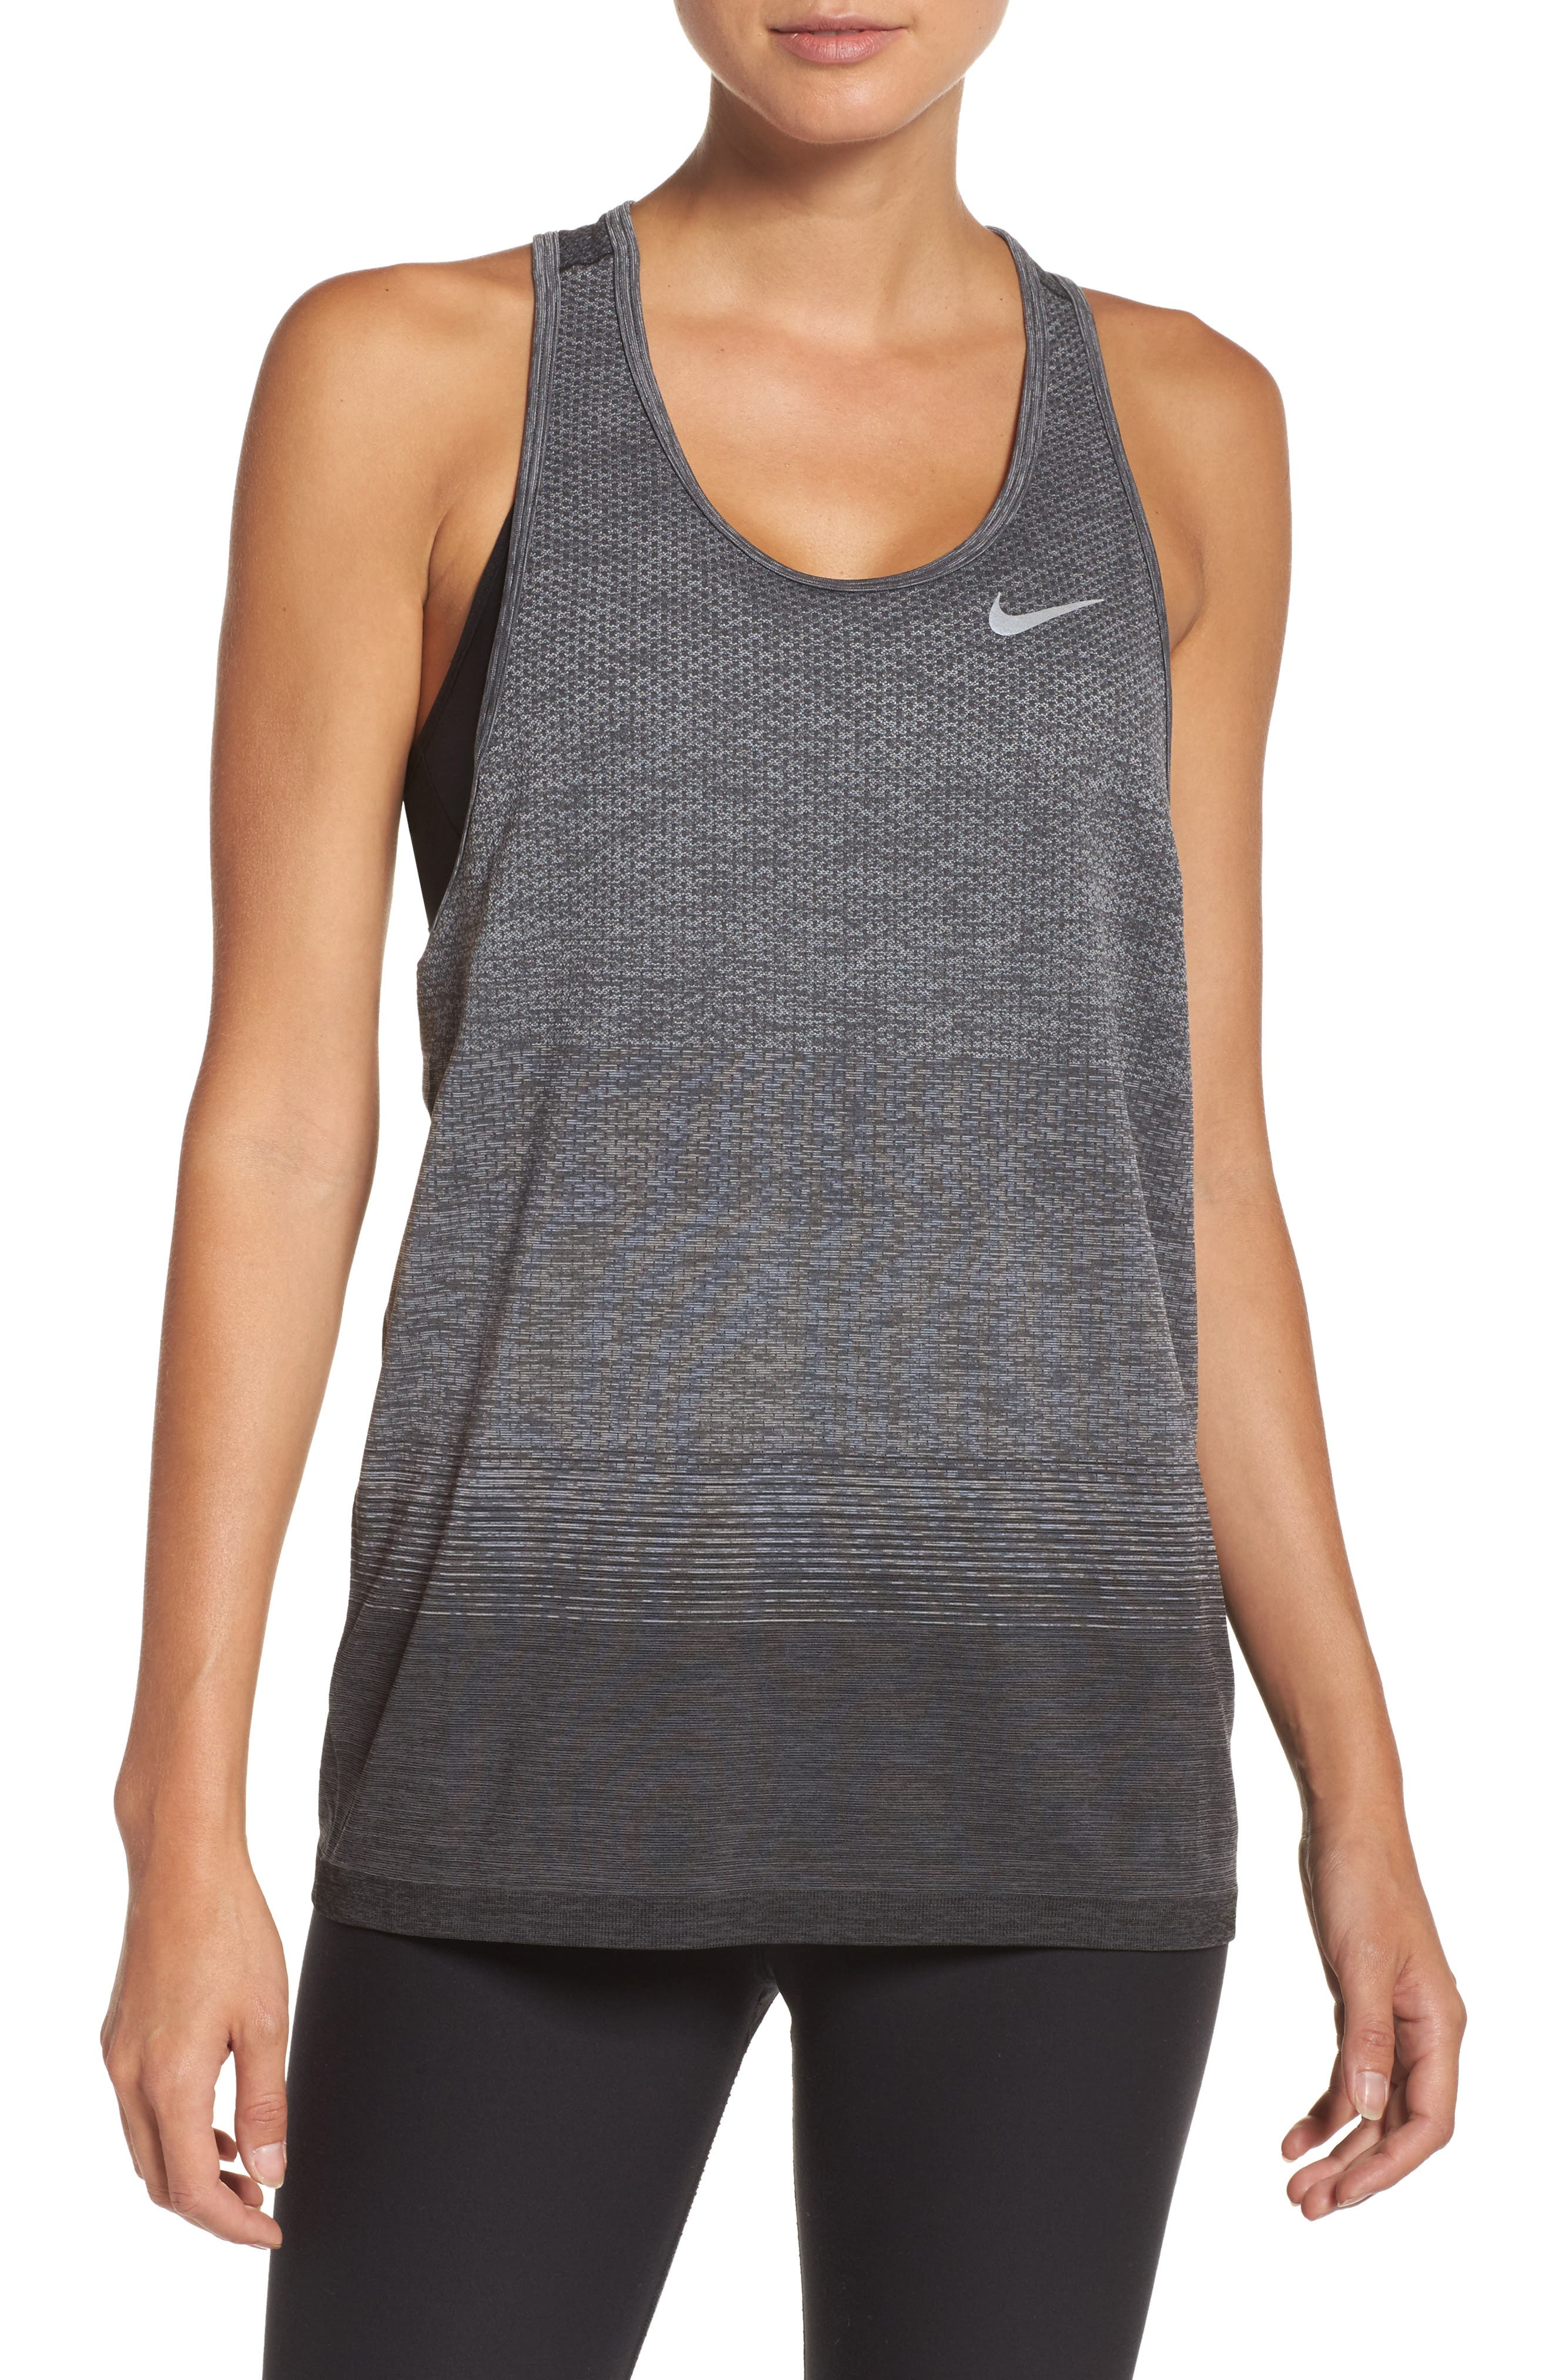 Nike Dry-FIT Knit Tank